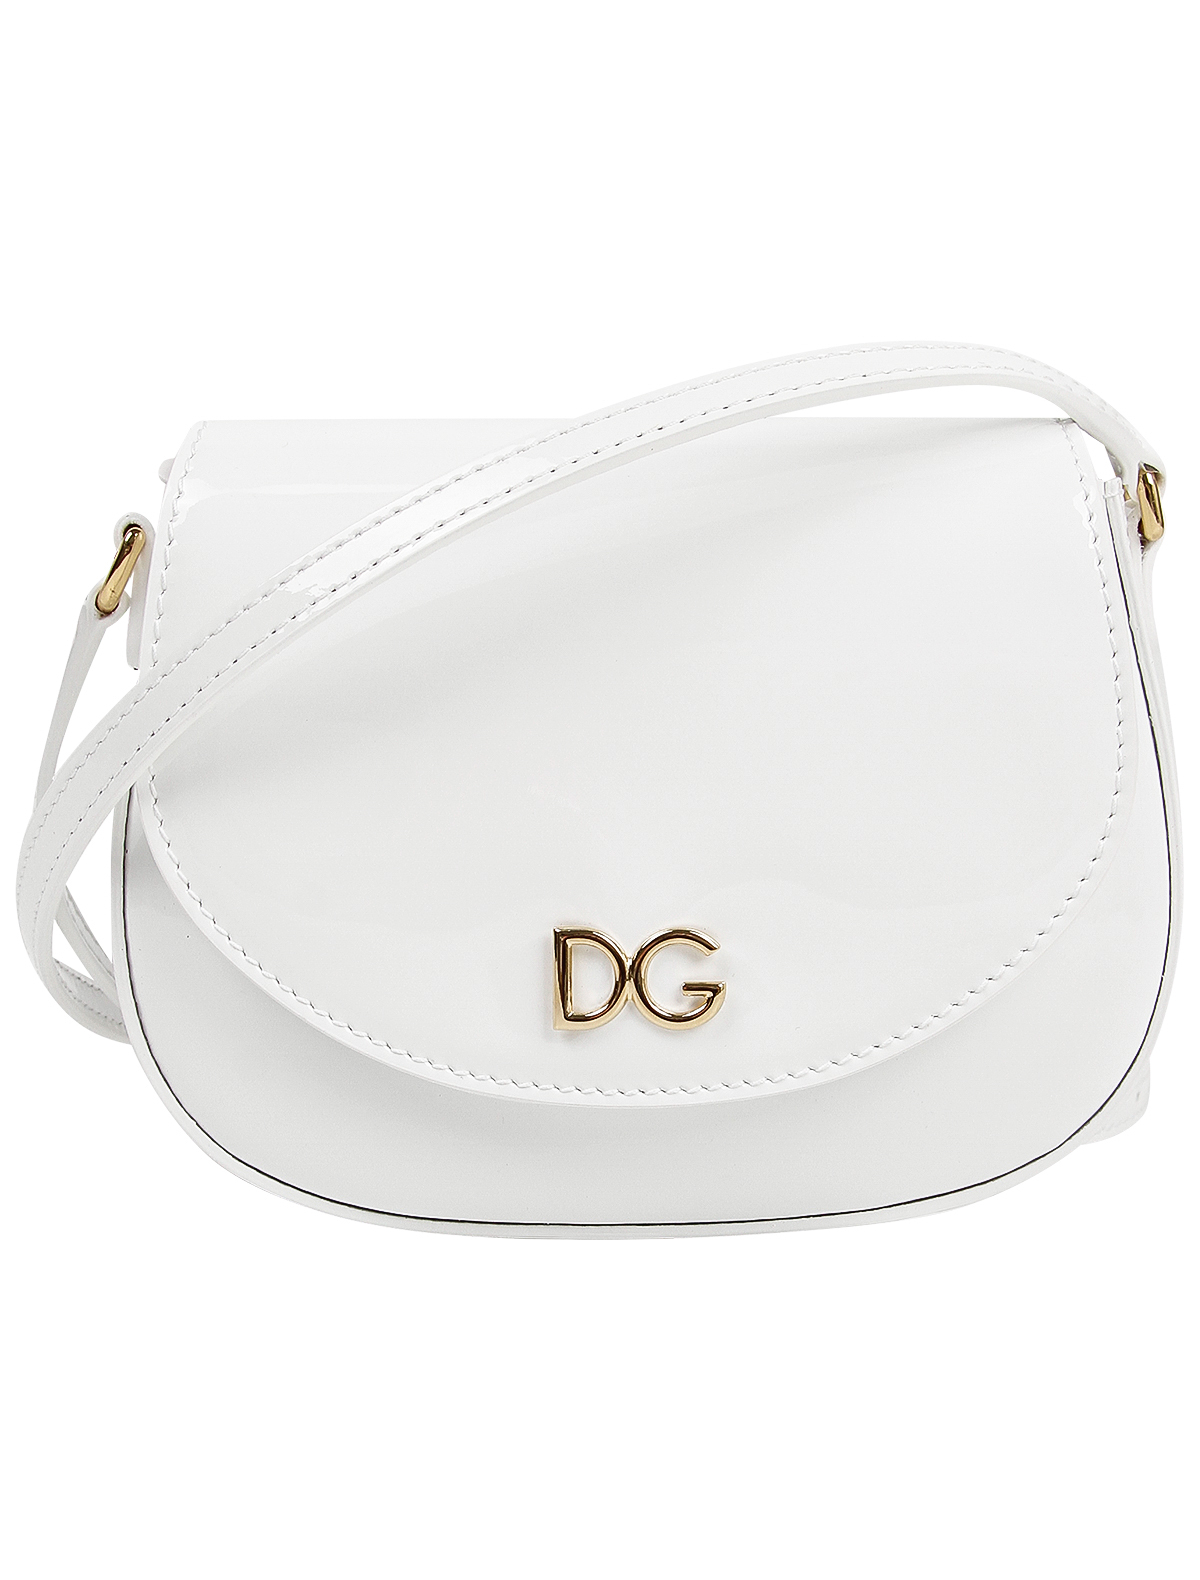 Сумка Dolce & Gabbana 2232648 белого цвета